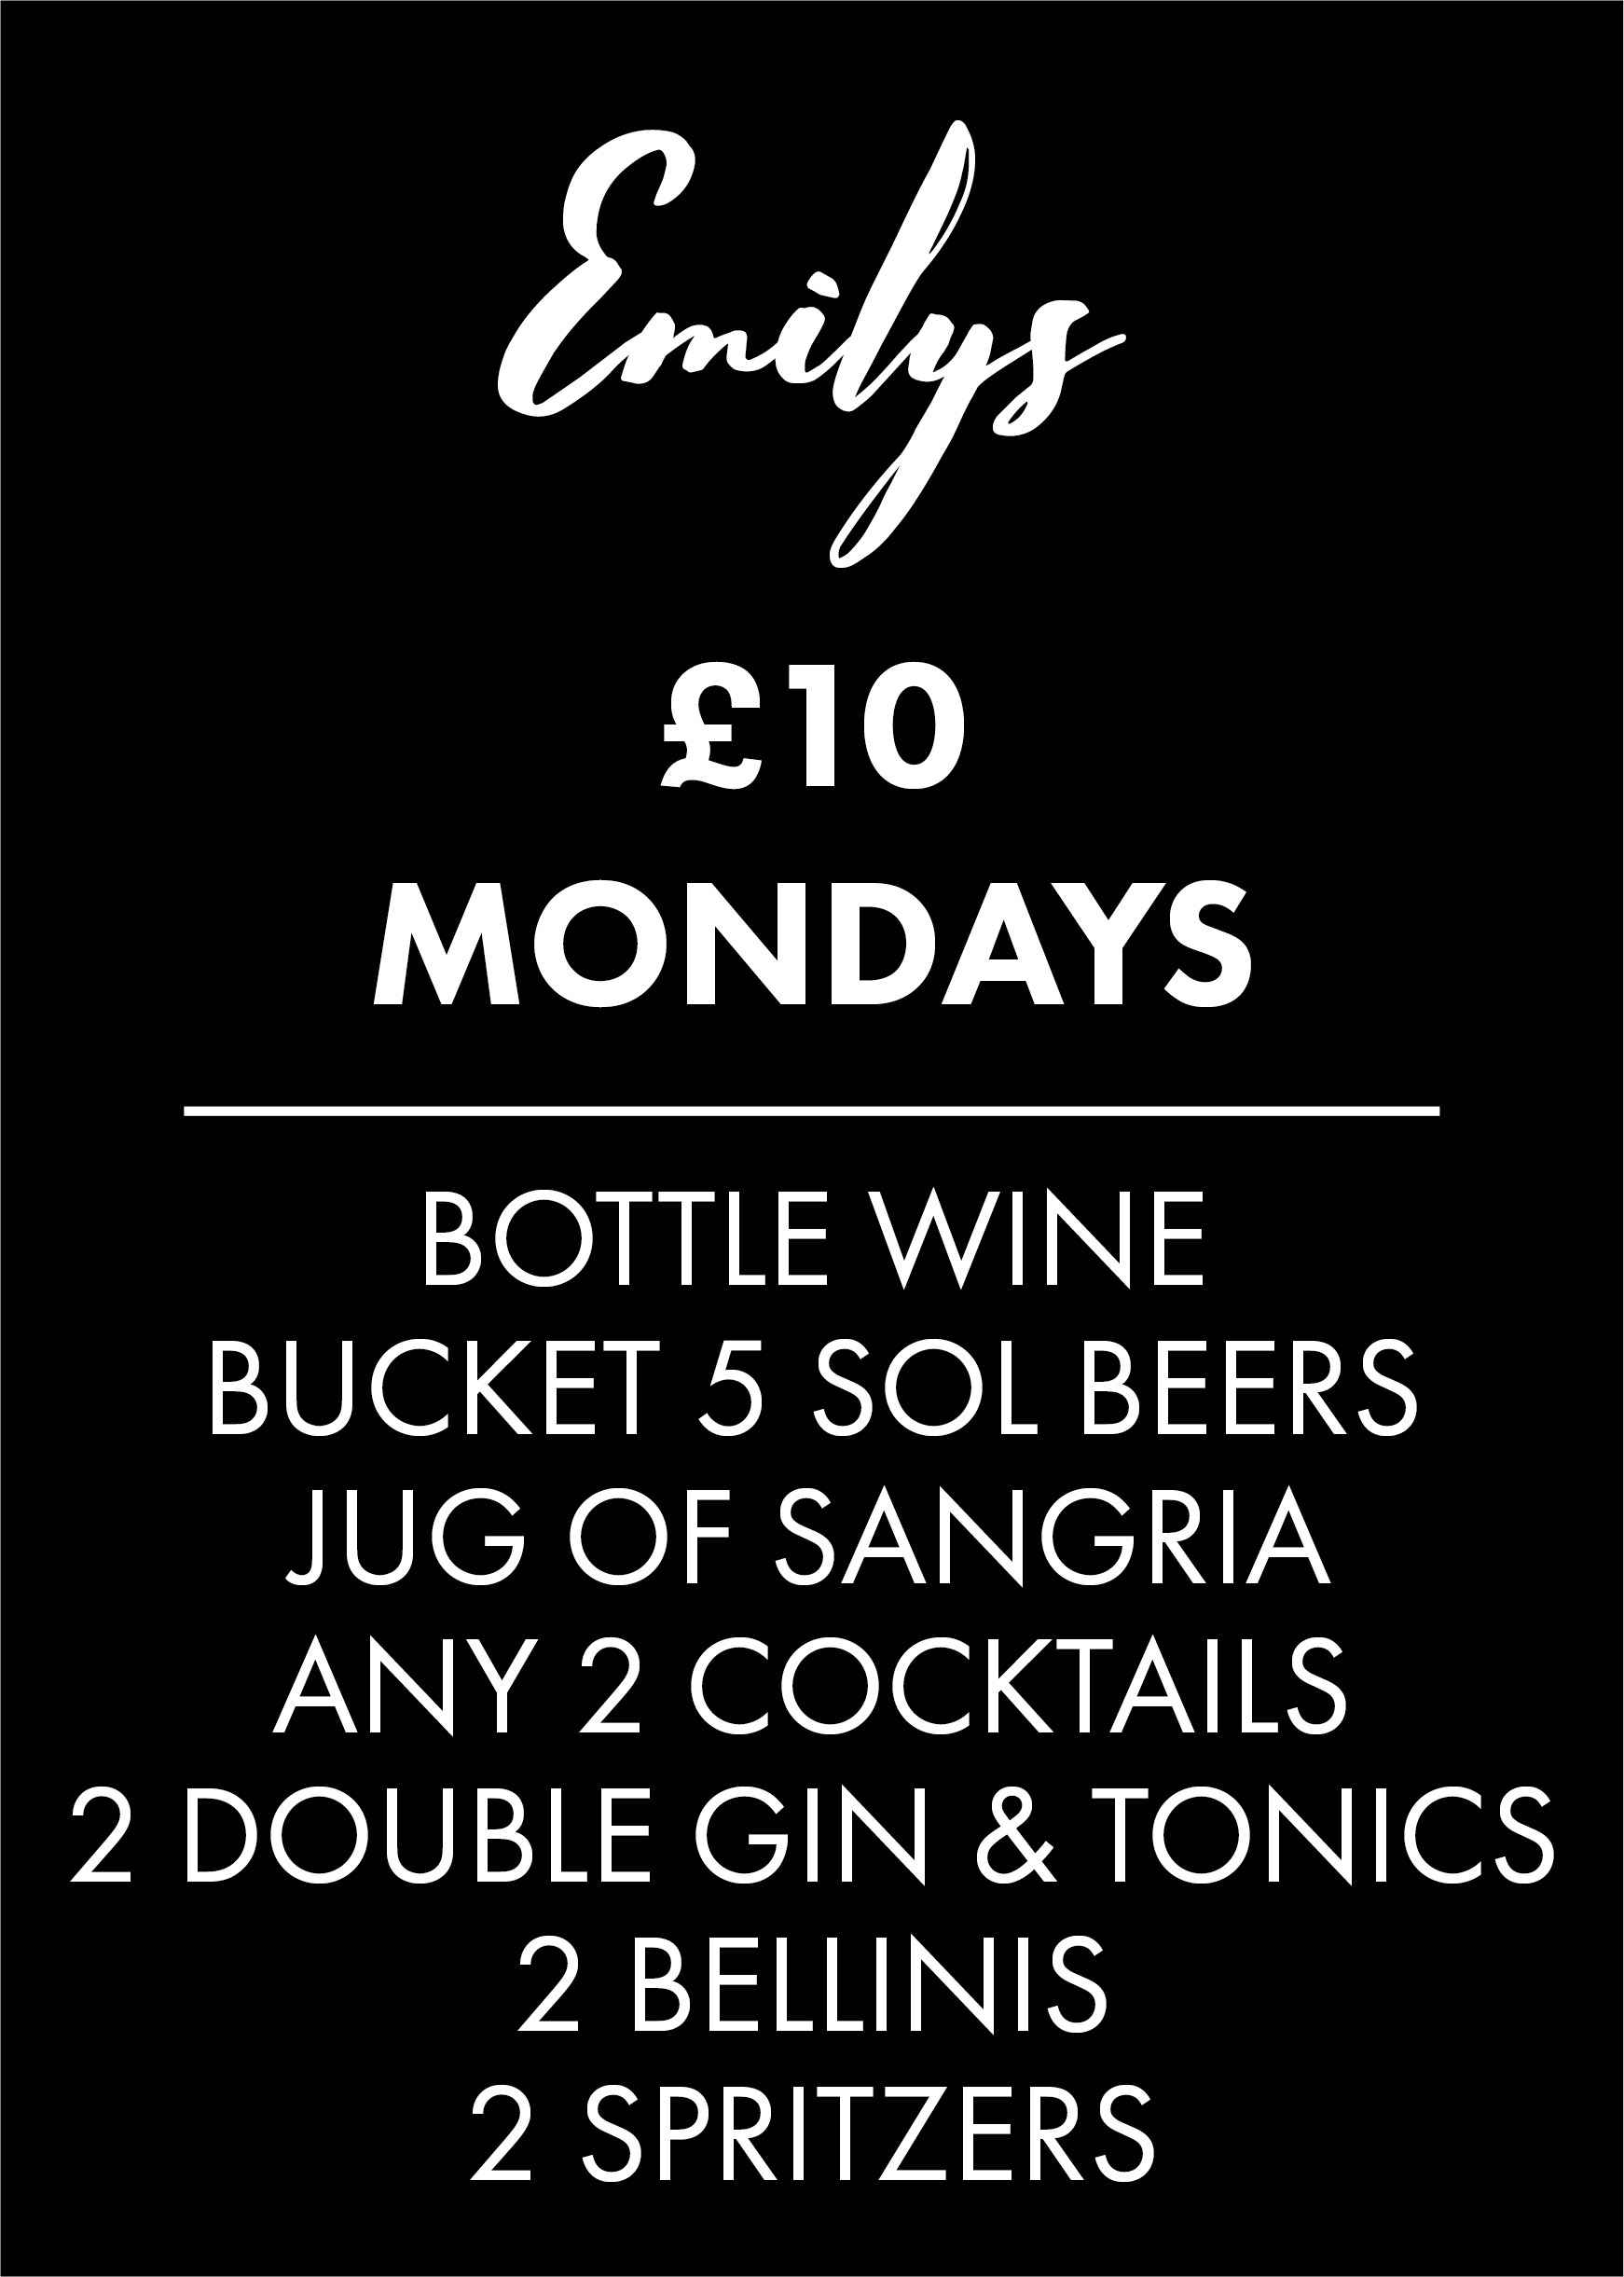 £10 Mondays